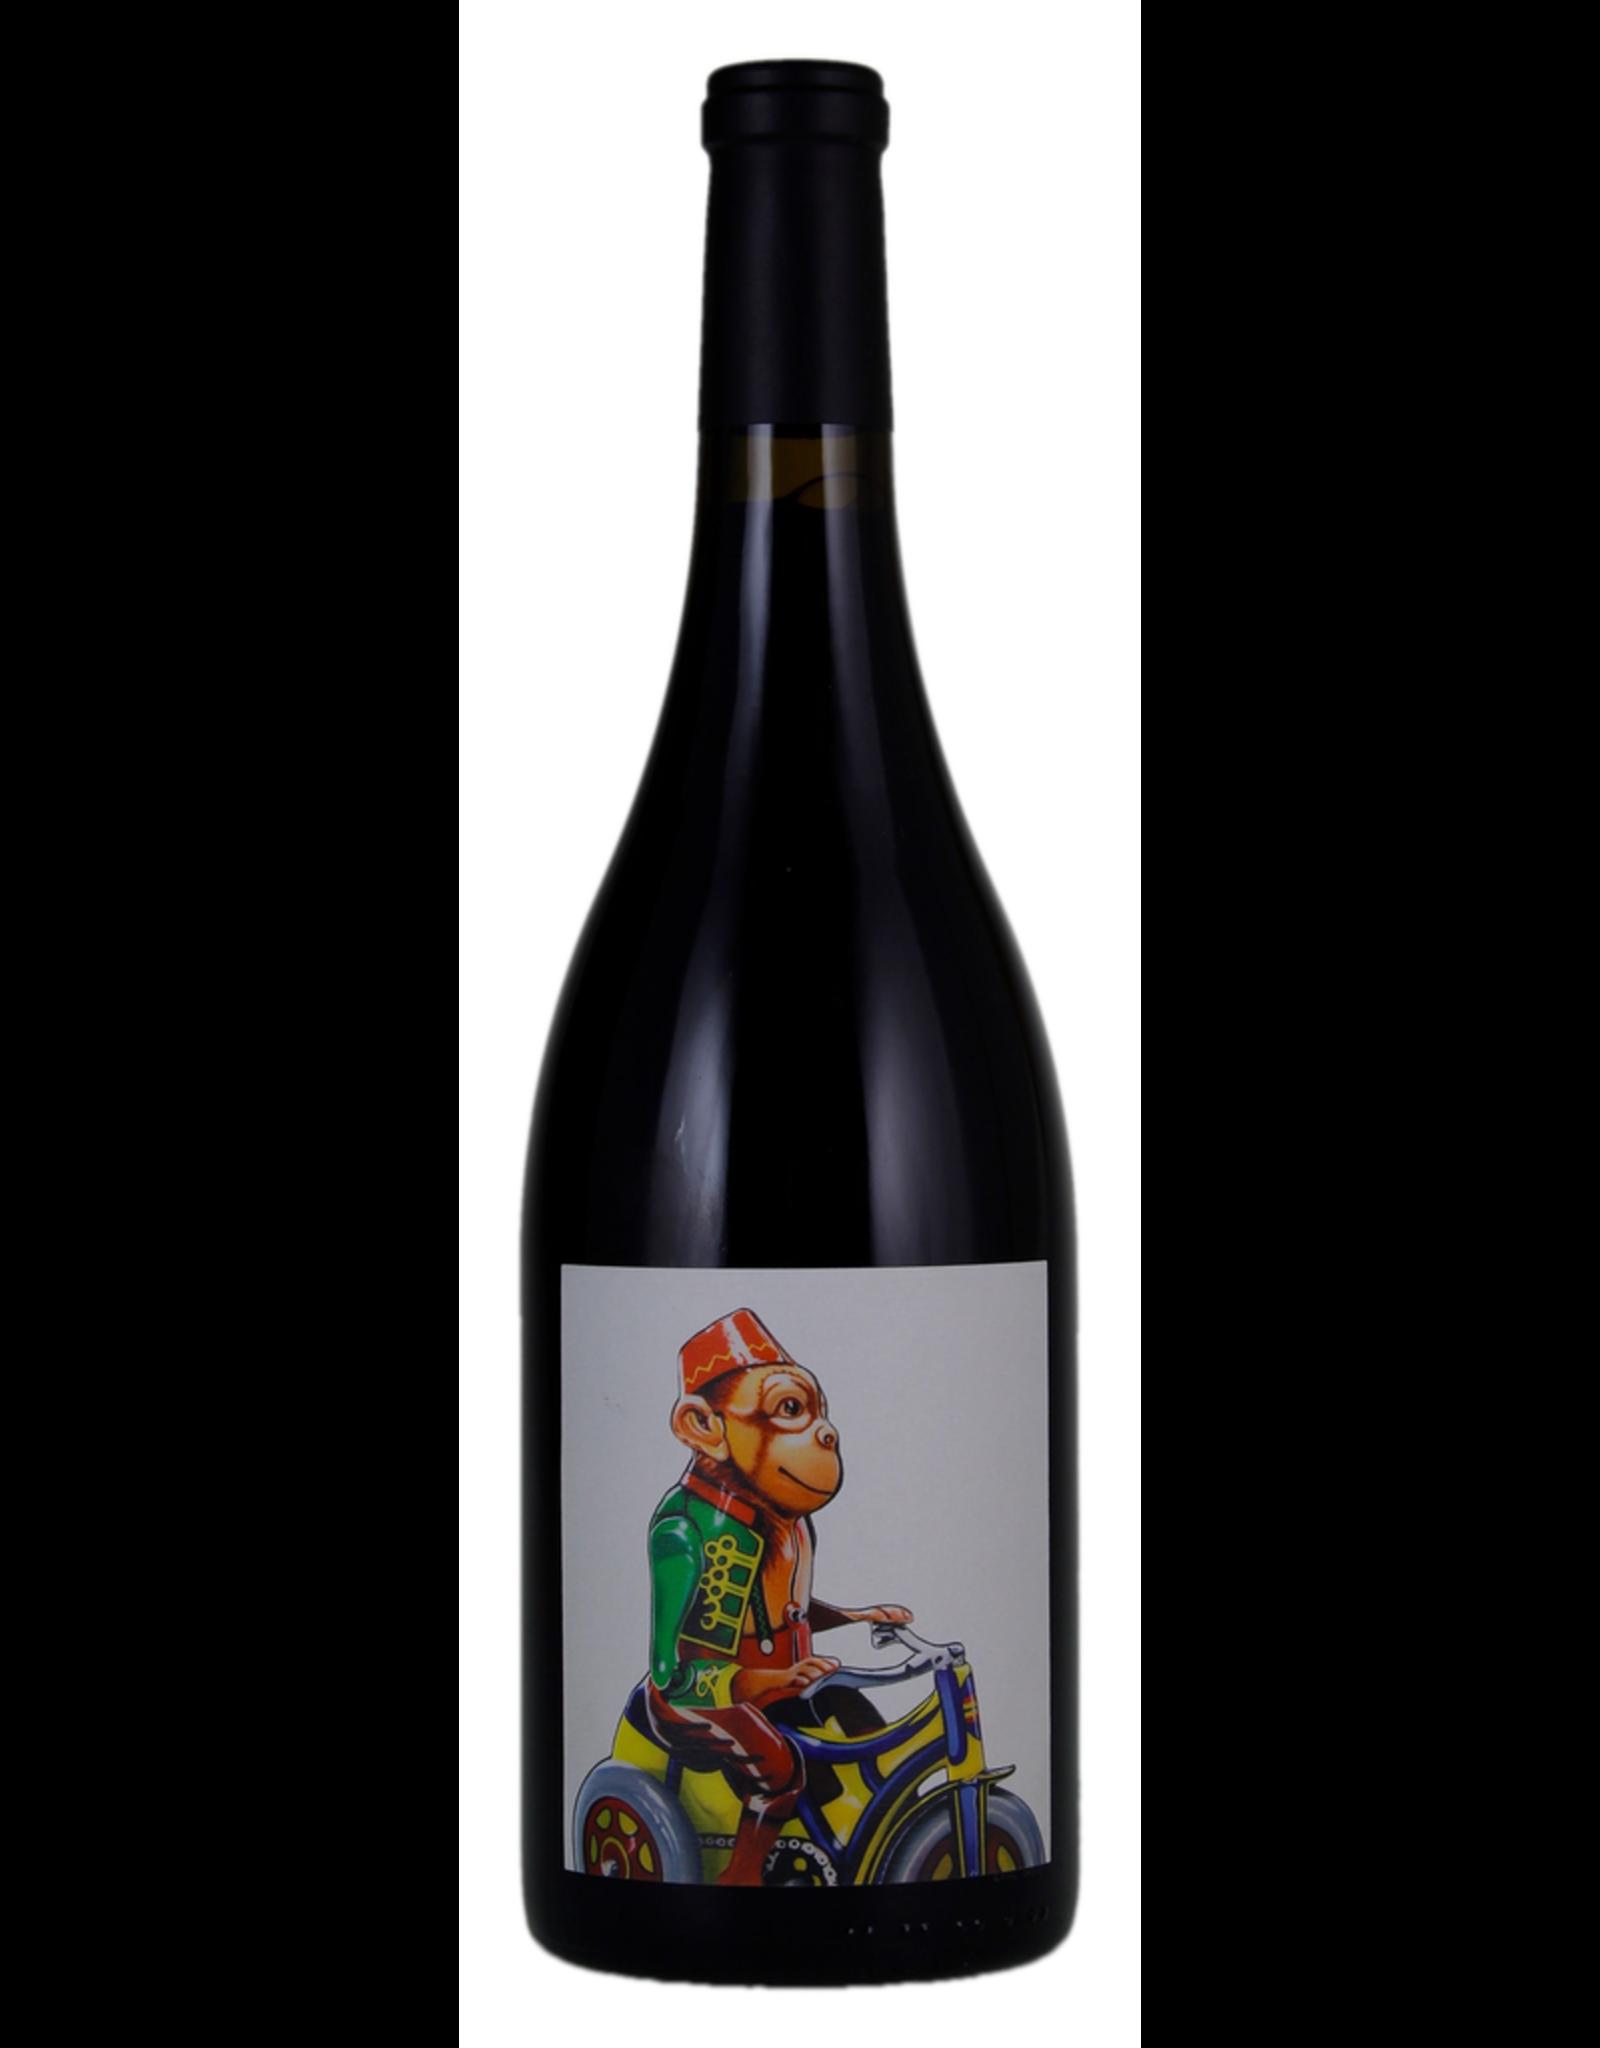 Red Wine 2012, Eric Kent Kalen's Big Boy Blend, Syrah, Bennett Valley, Sonoma County, California,14.8% Alc, CT91, TW93